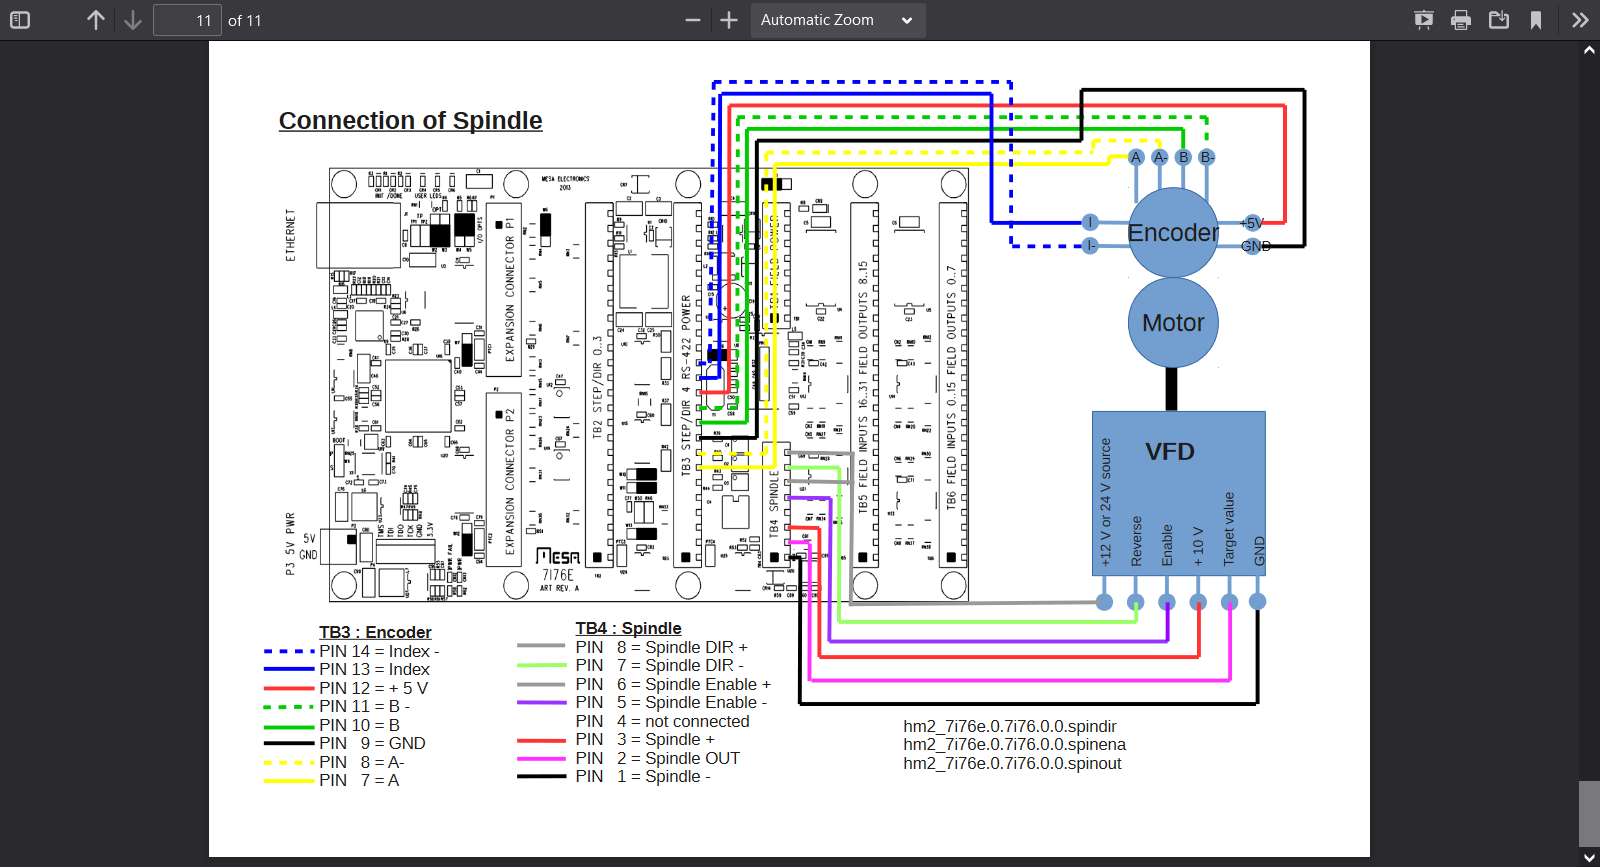 7i76_wiringpdf.png